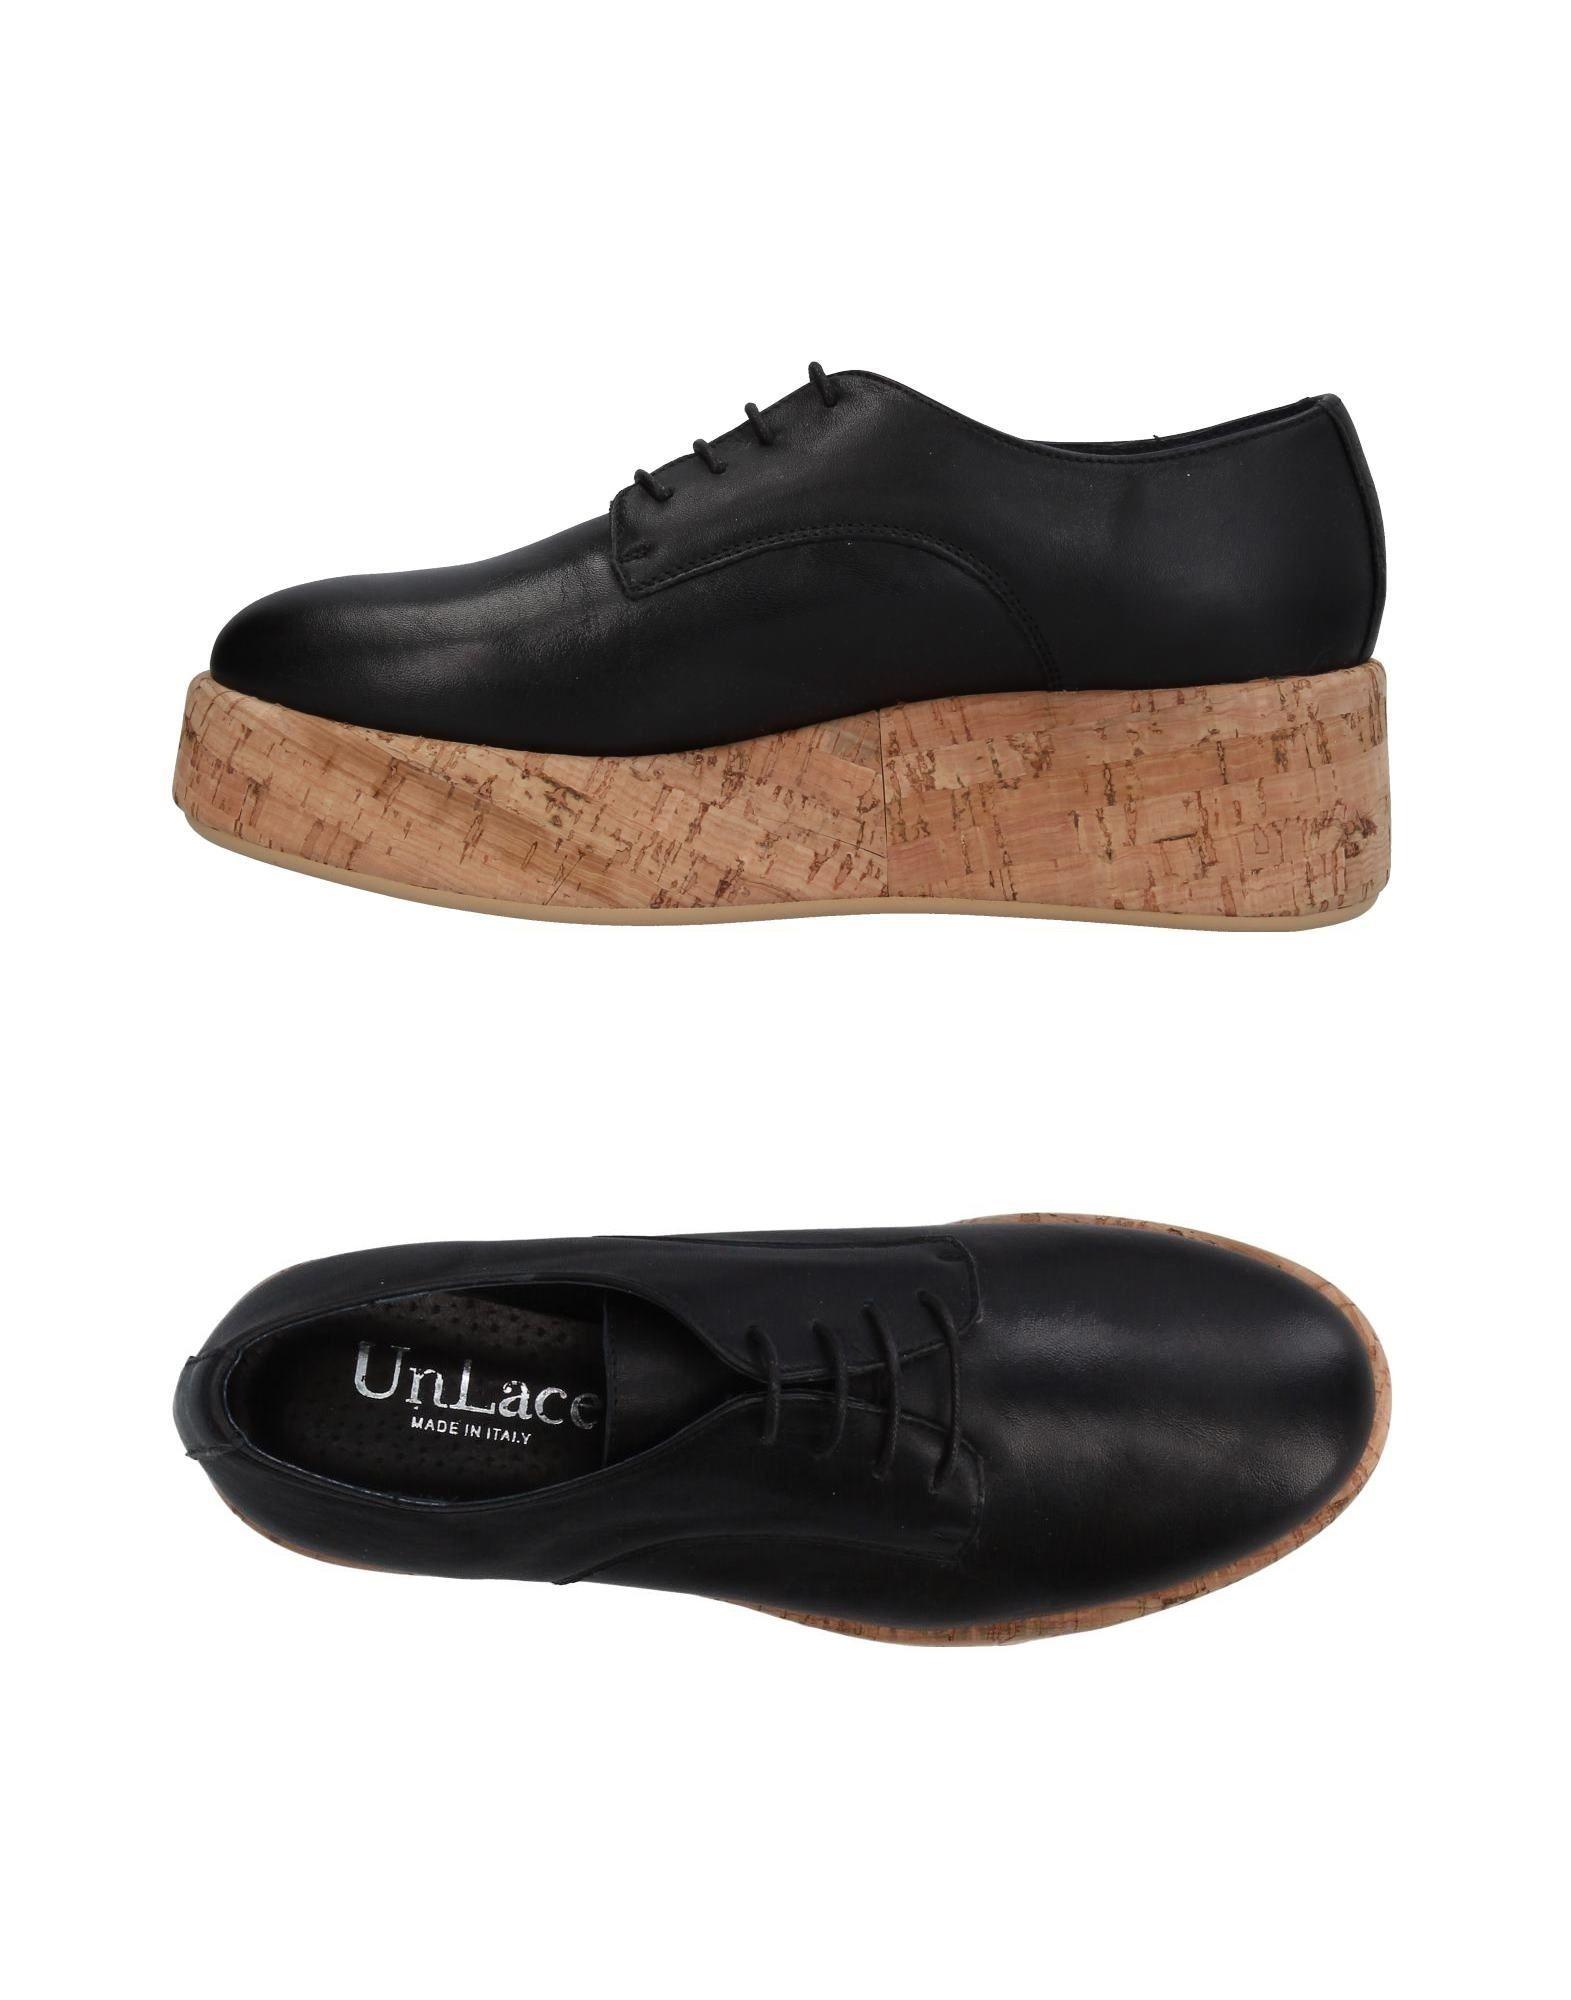 Unlace Schnürschuhe Damen  11376333UB Gute Qualität beliebte Schuhe